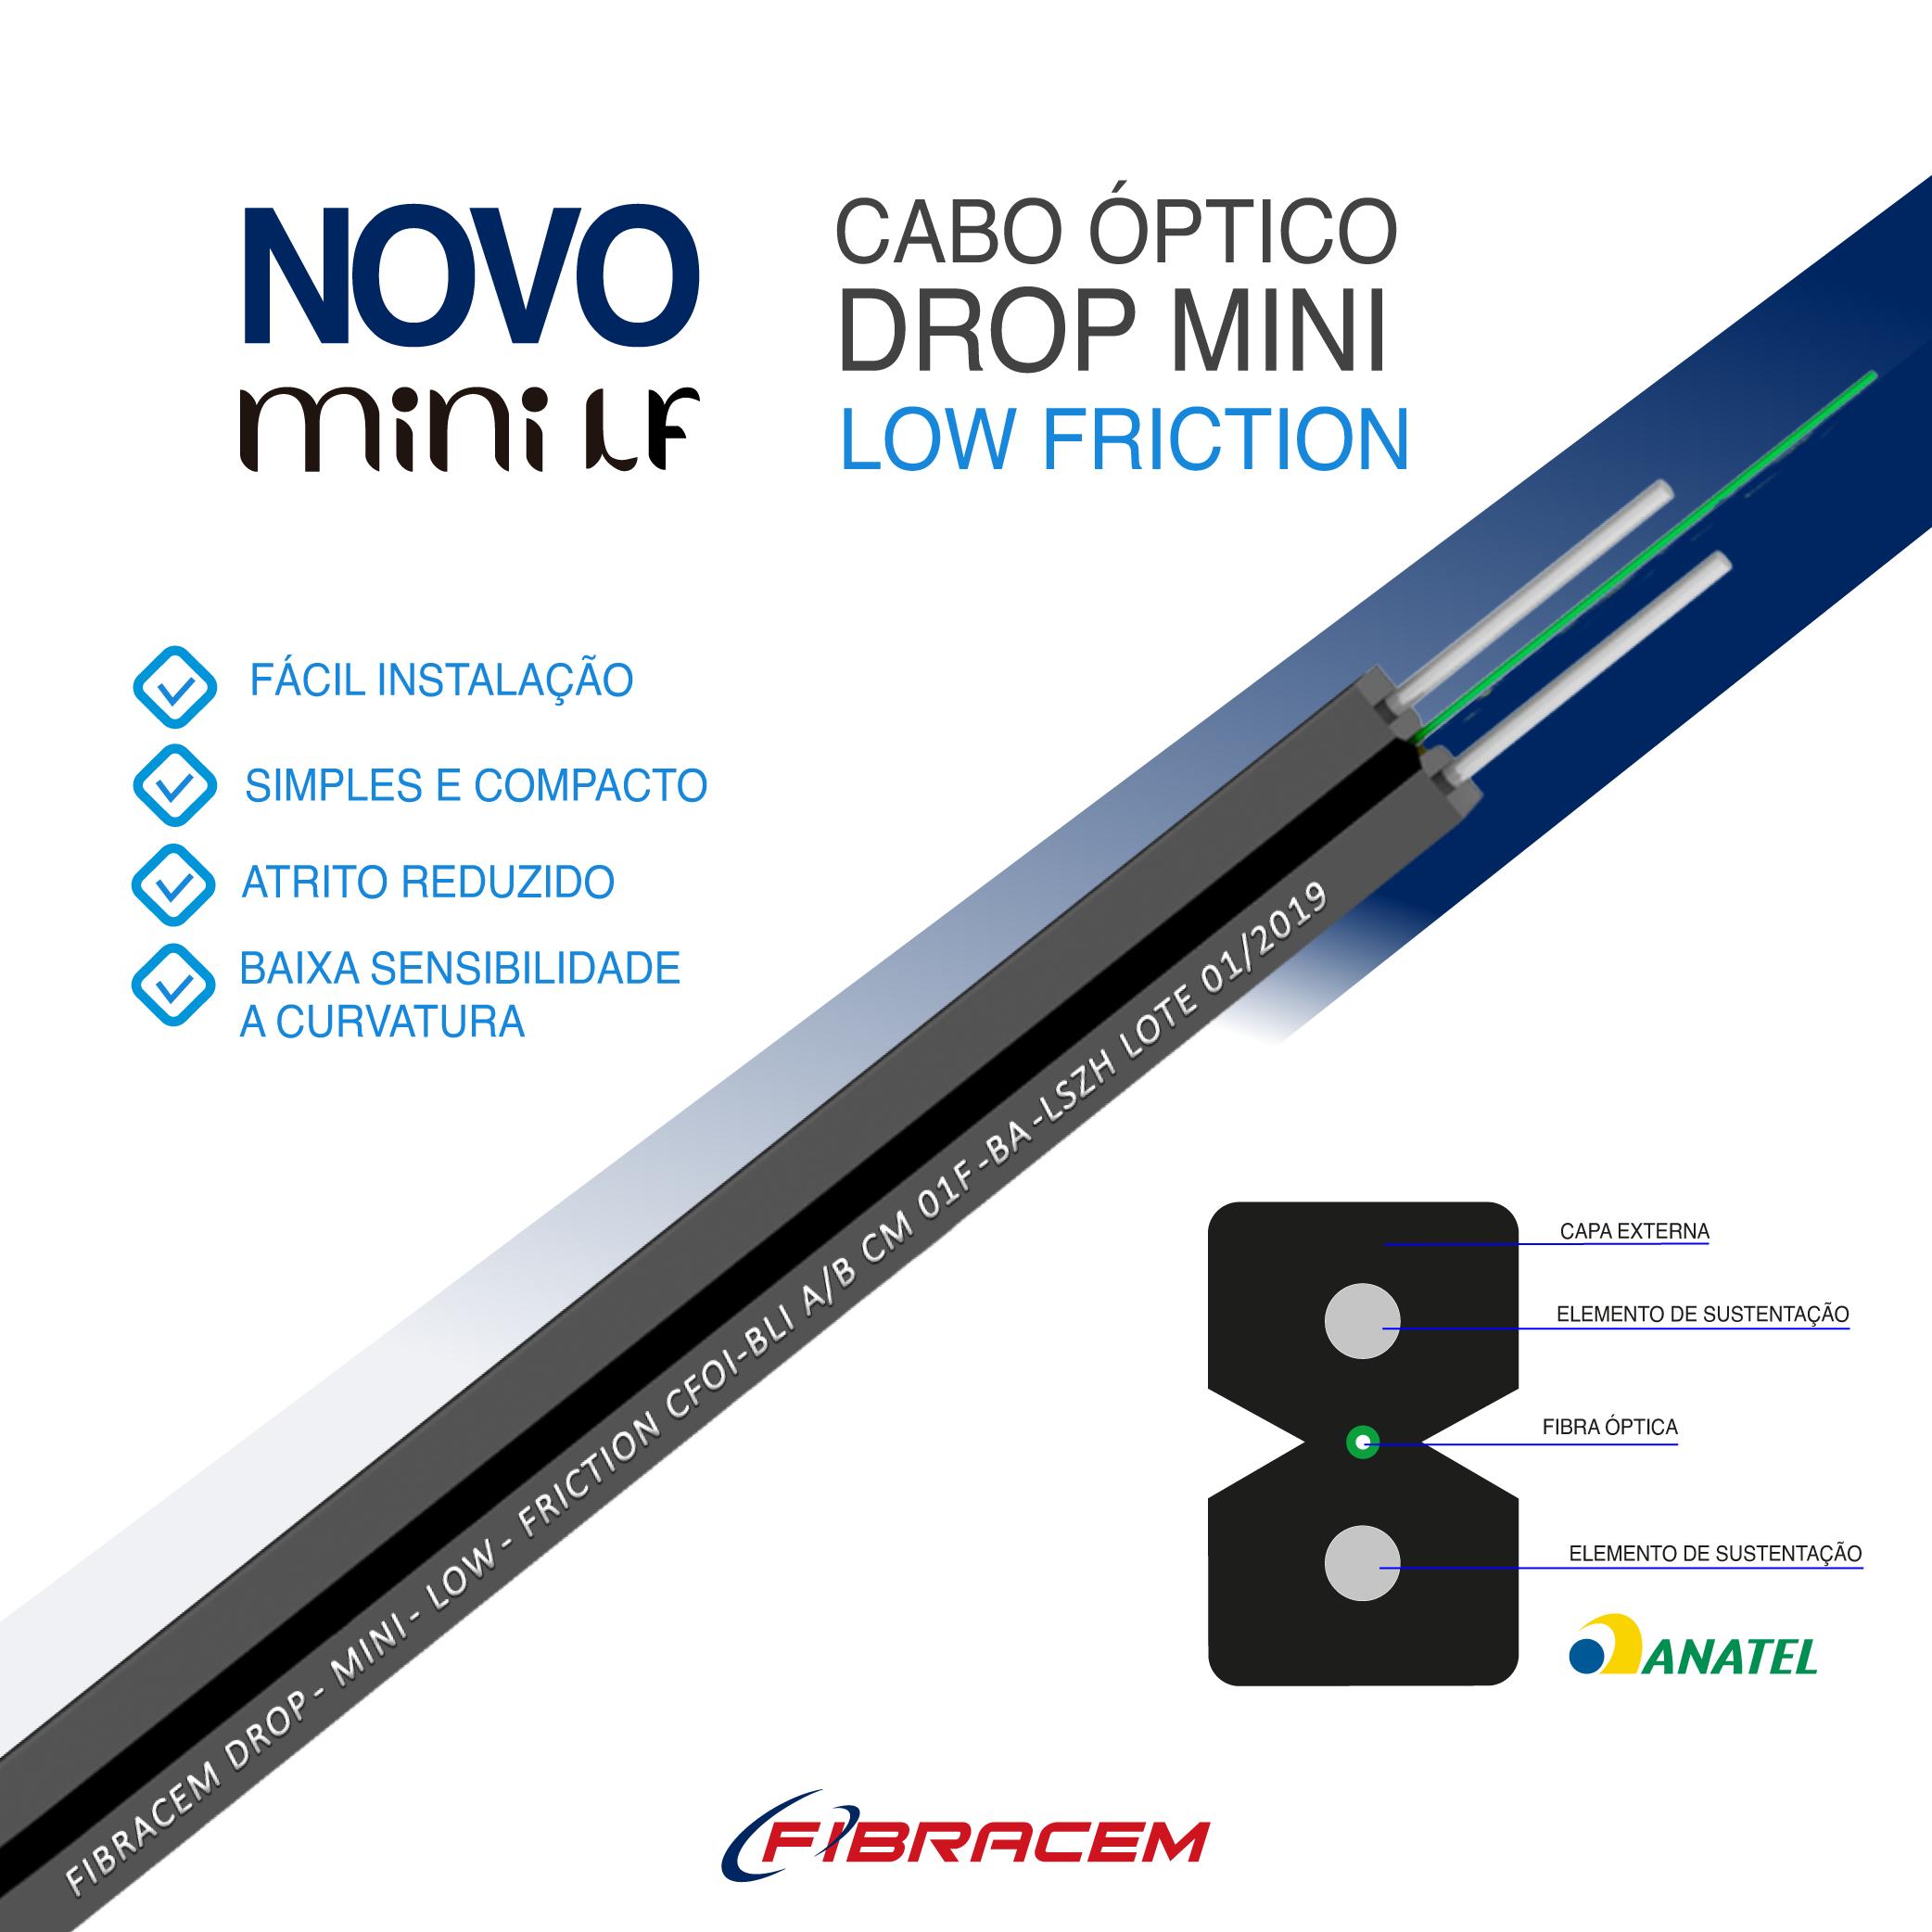 Conheça o novo Cabo Óptico Drop Mini Low Friction